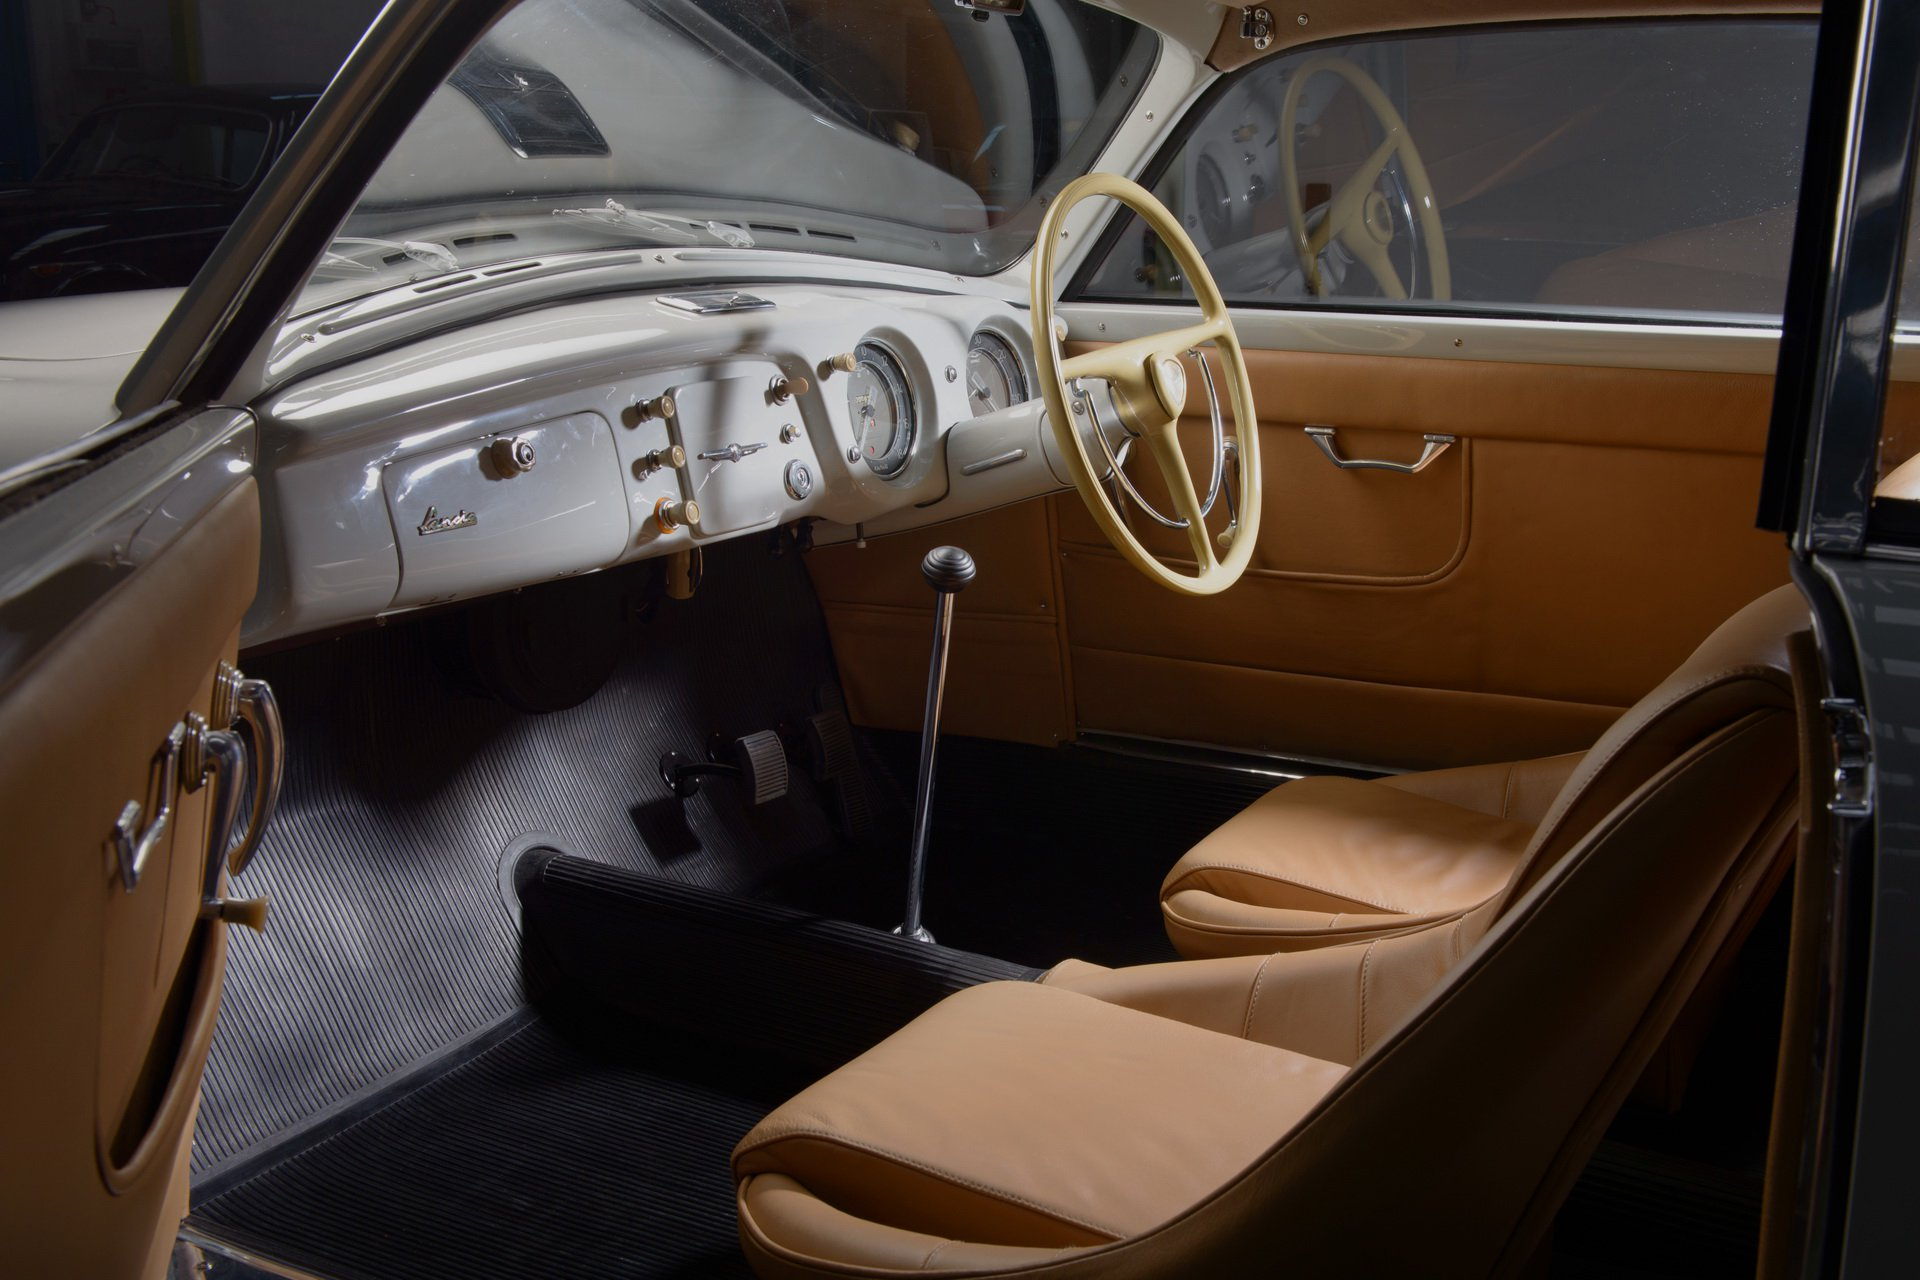 Lancia-Aurelia-B20-GT-restored-14